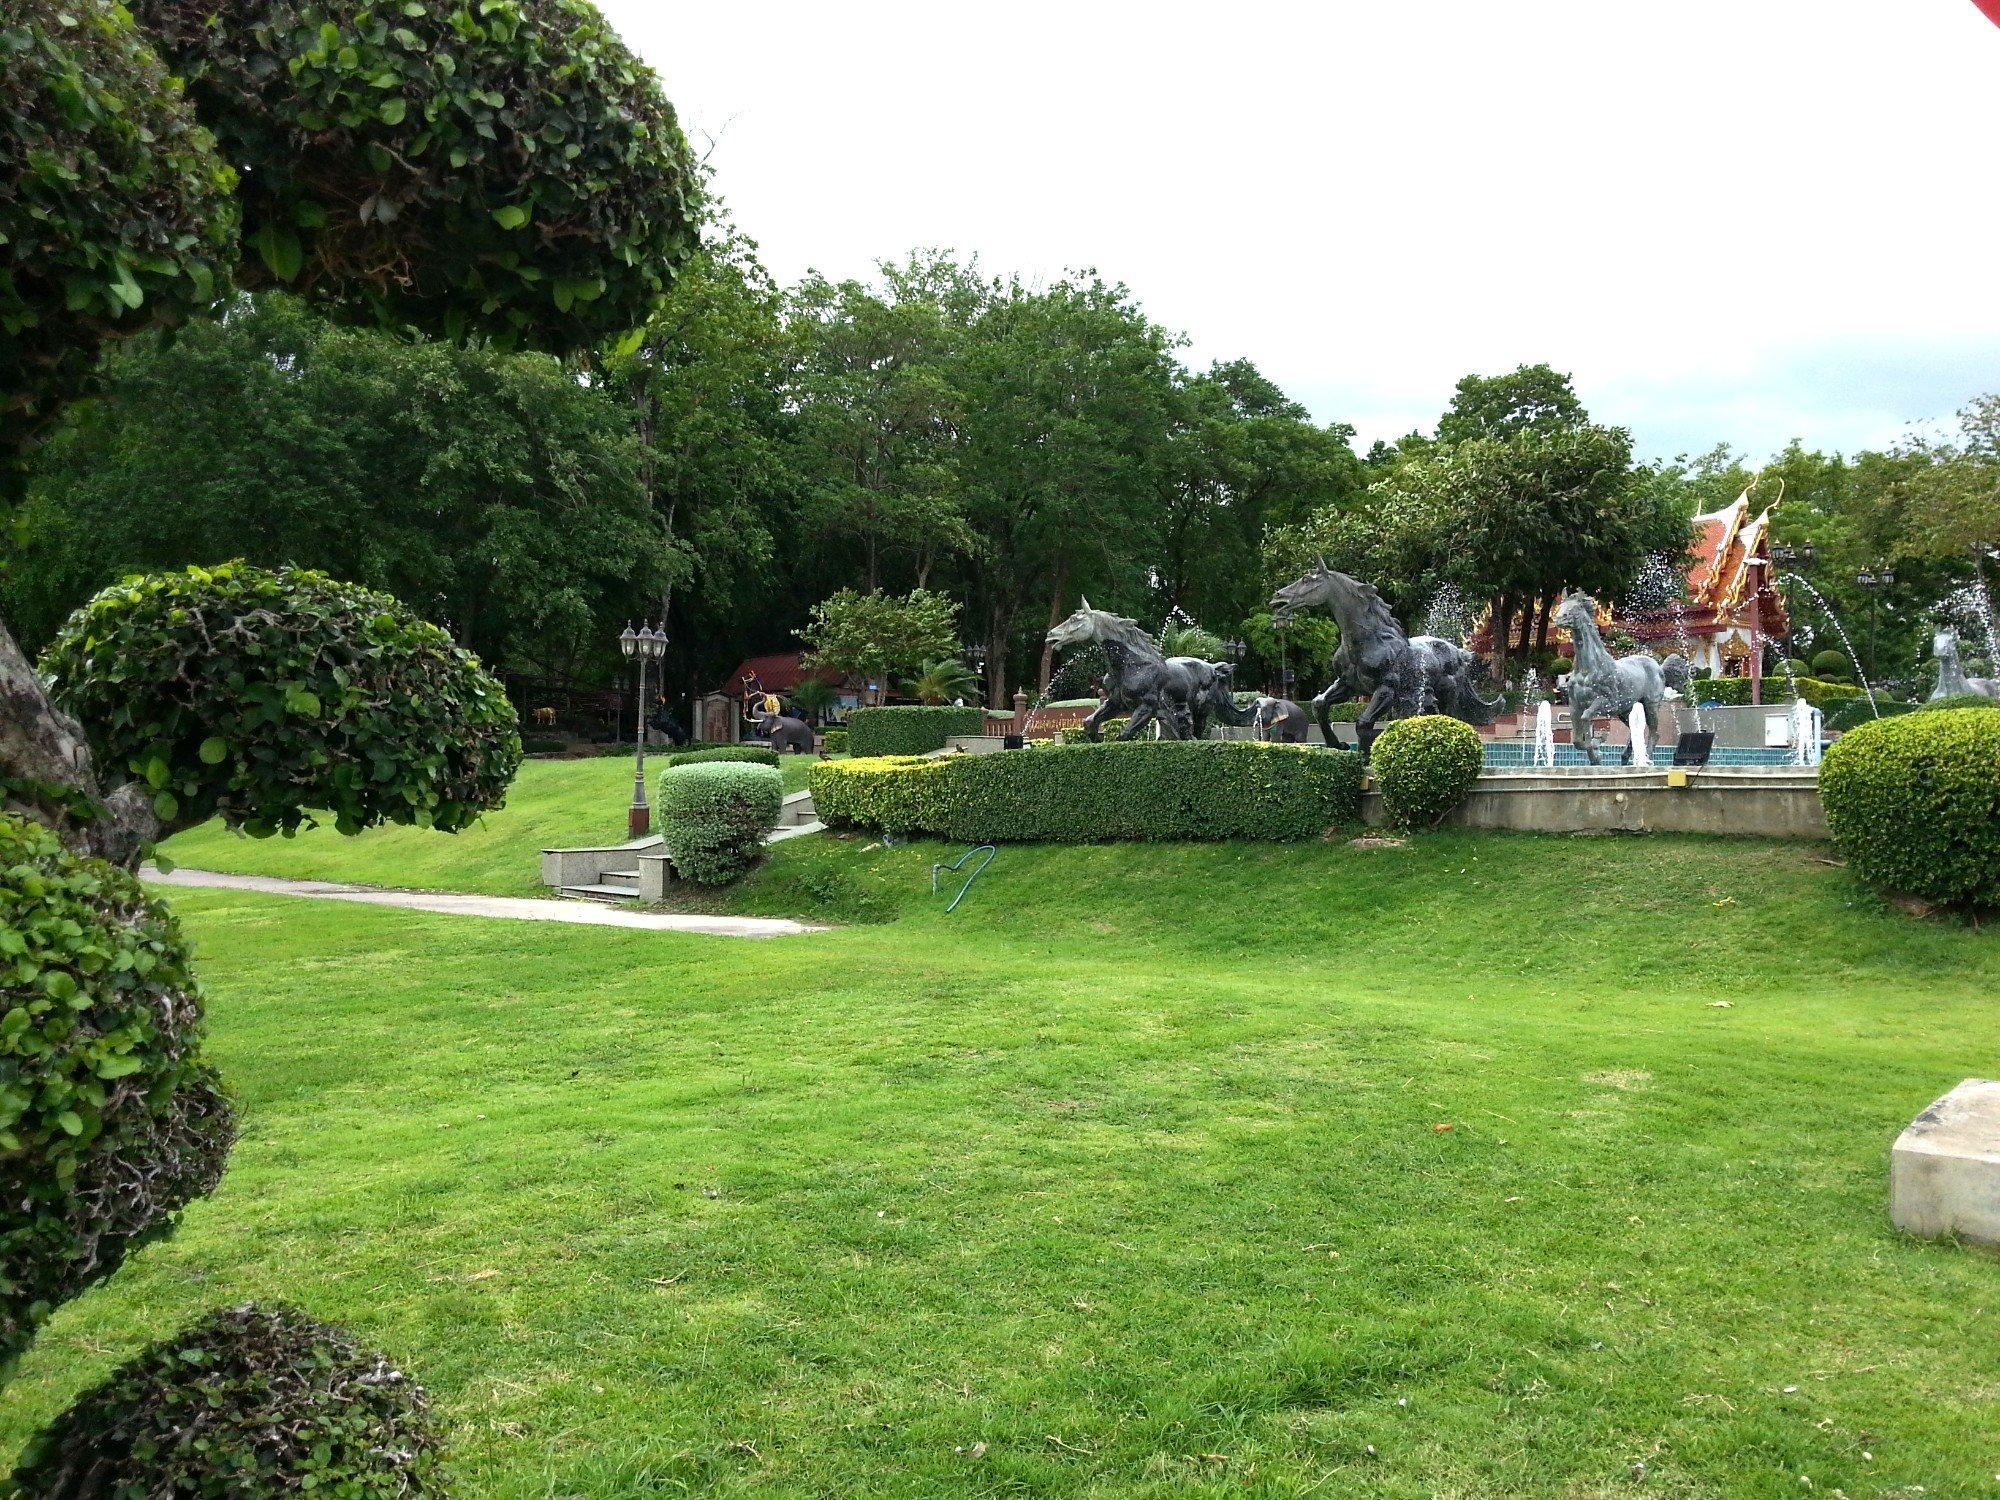 Landscaped gardens at the Taksin Maharat Shrine